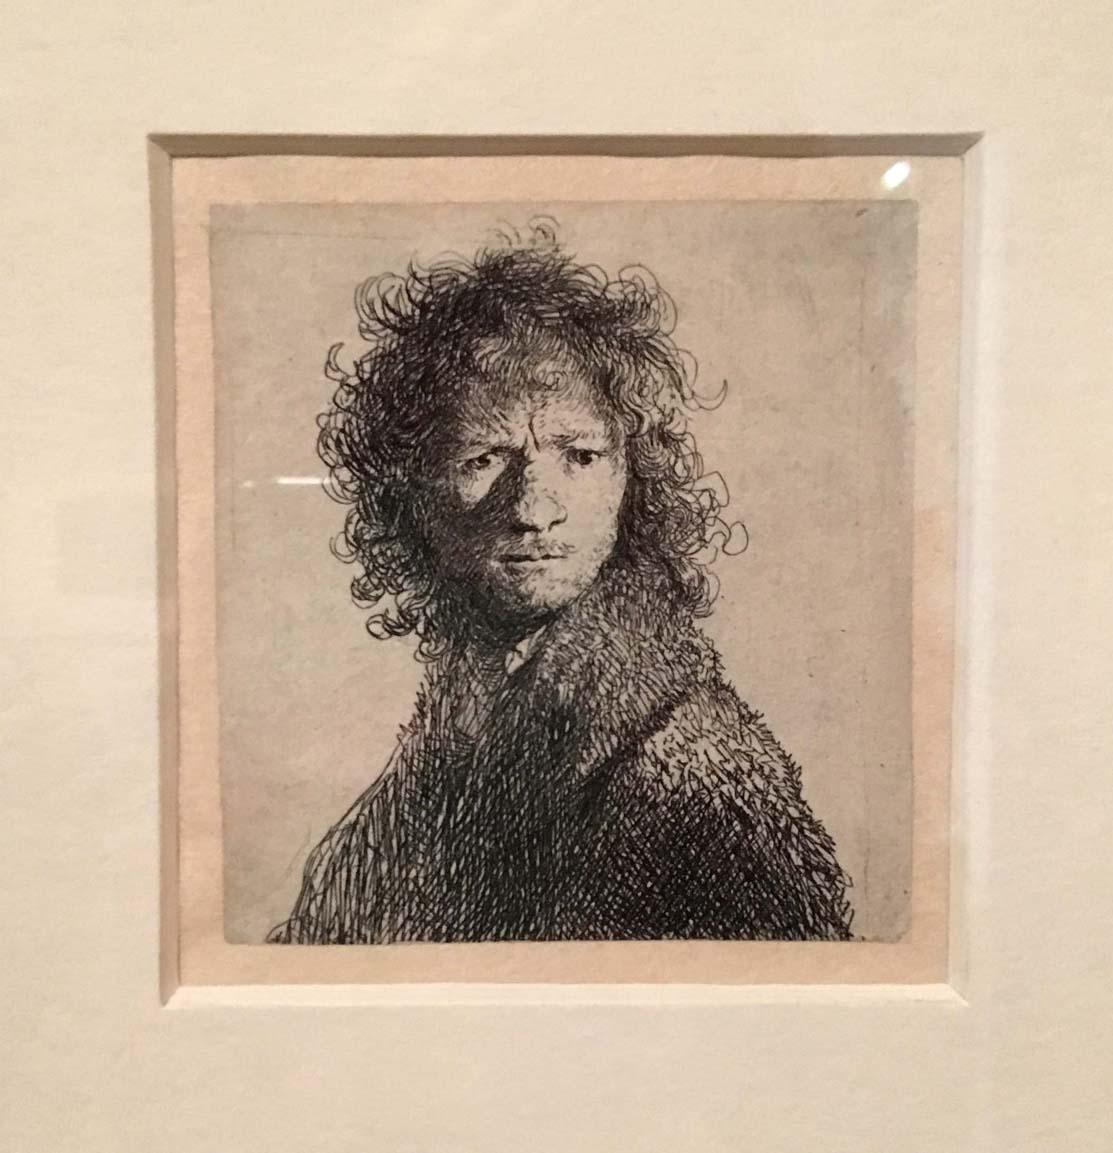 Rembrandt, Self portrait, etching